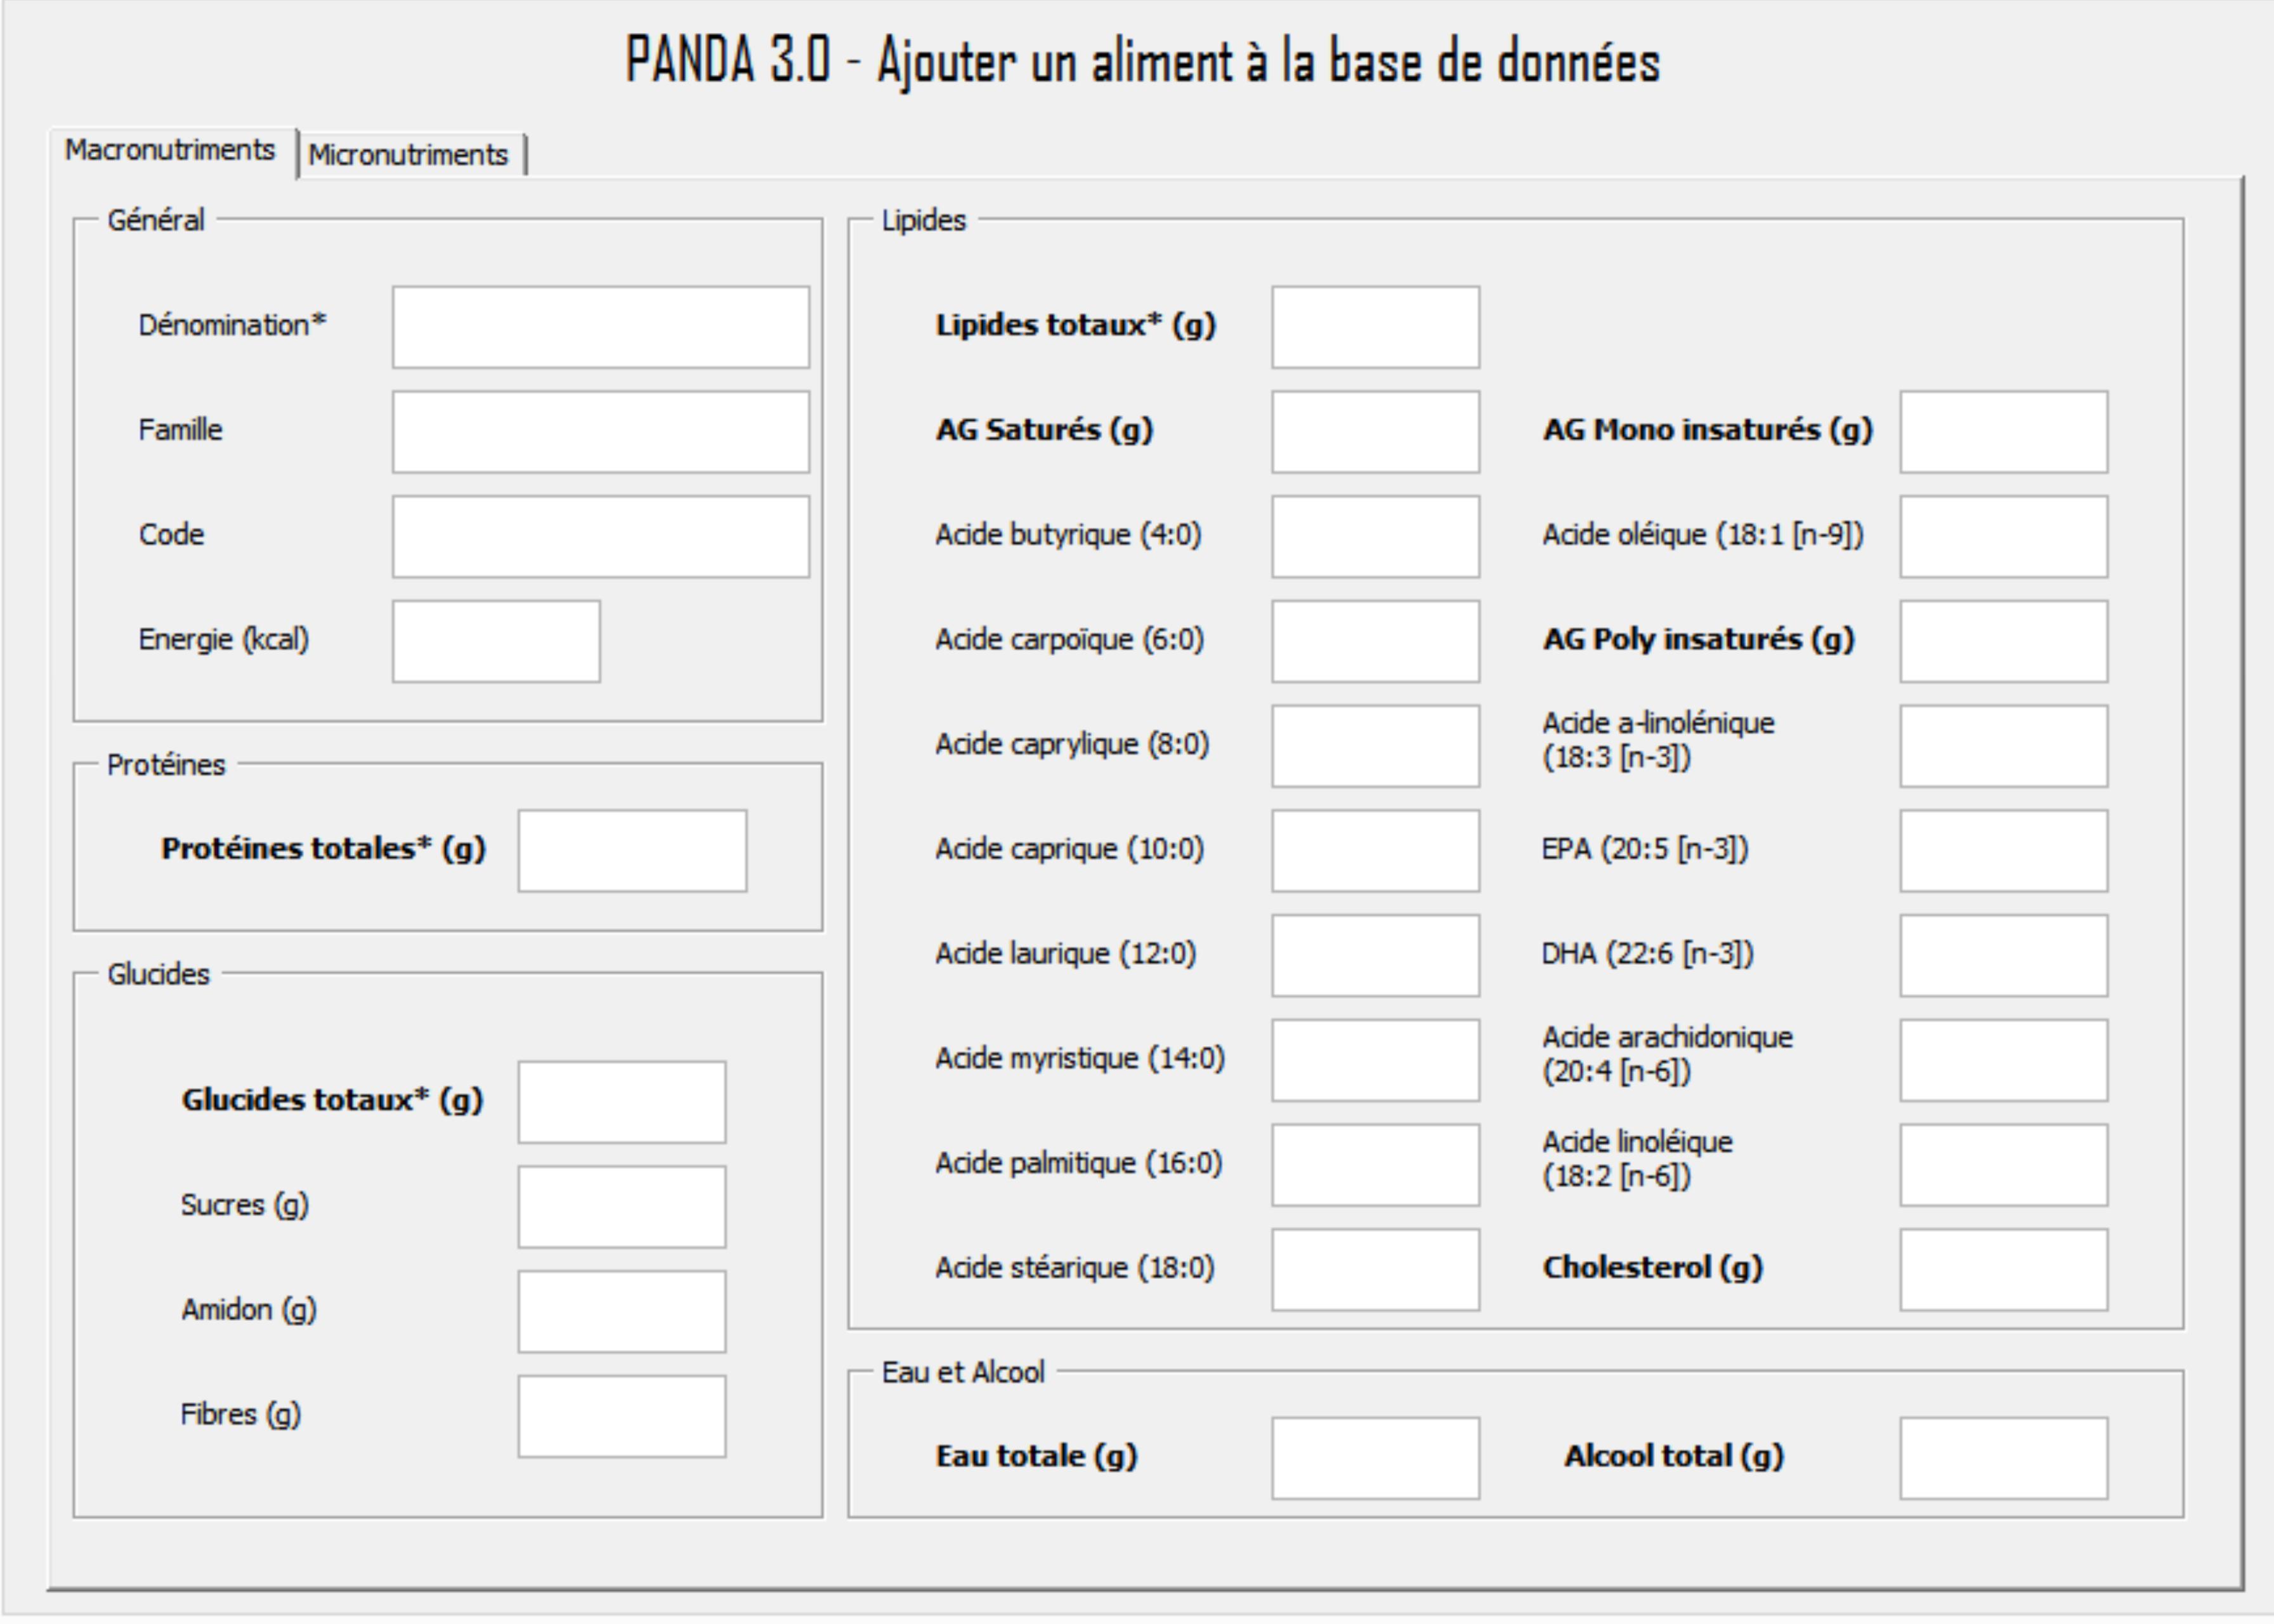 formule-de-black_calculs_micronutriments_panda-3.0